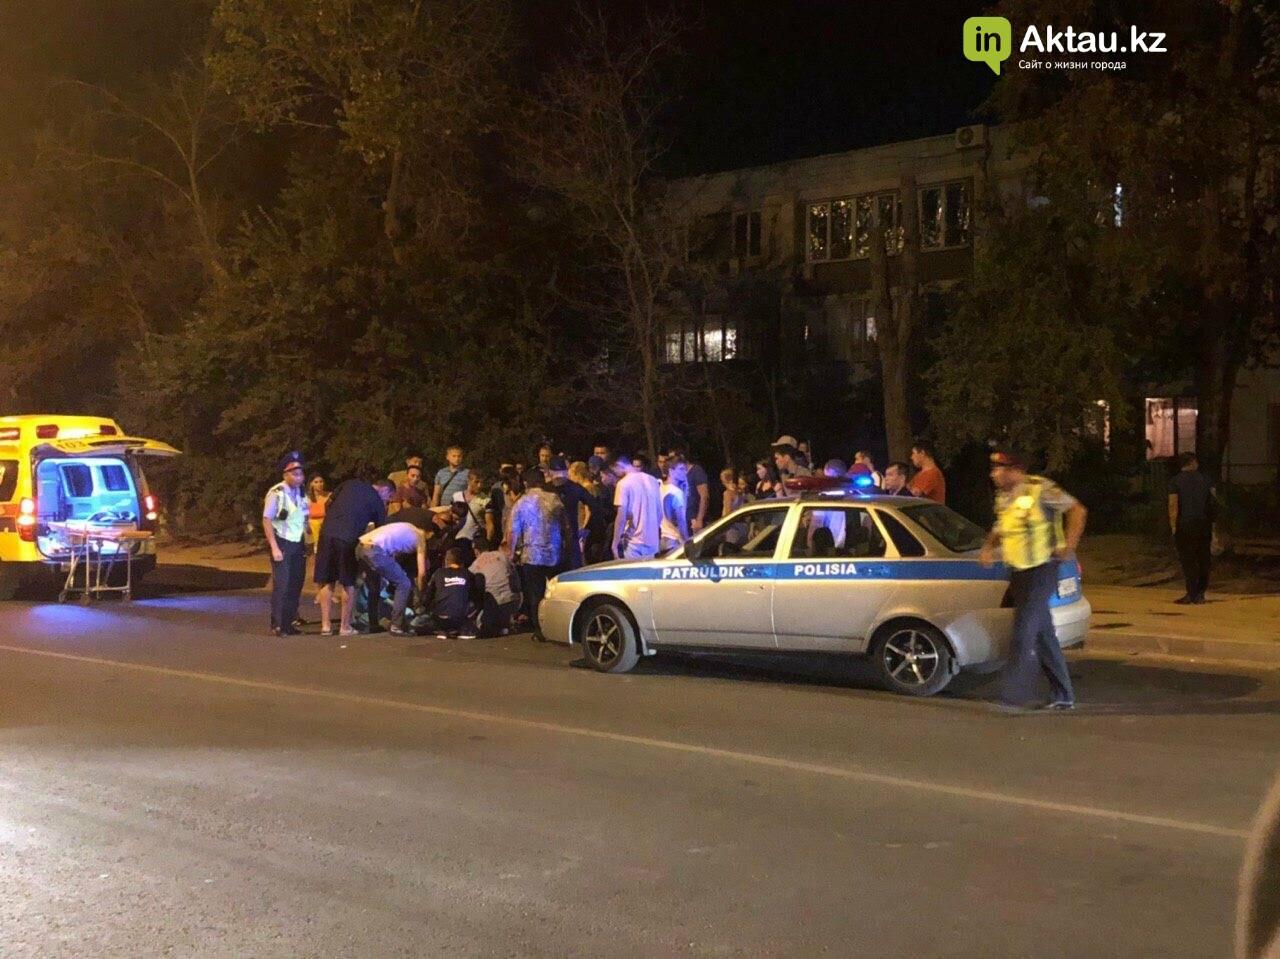 Мотоциклист пострадал в аварии в Актау (ВИДЕО), фото-3